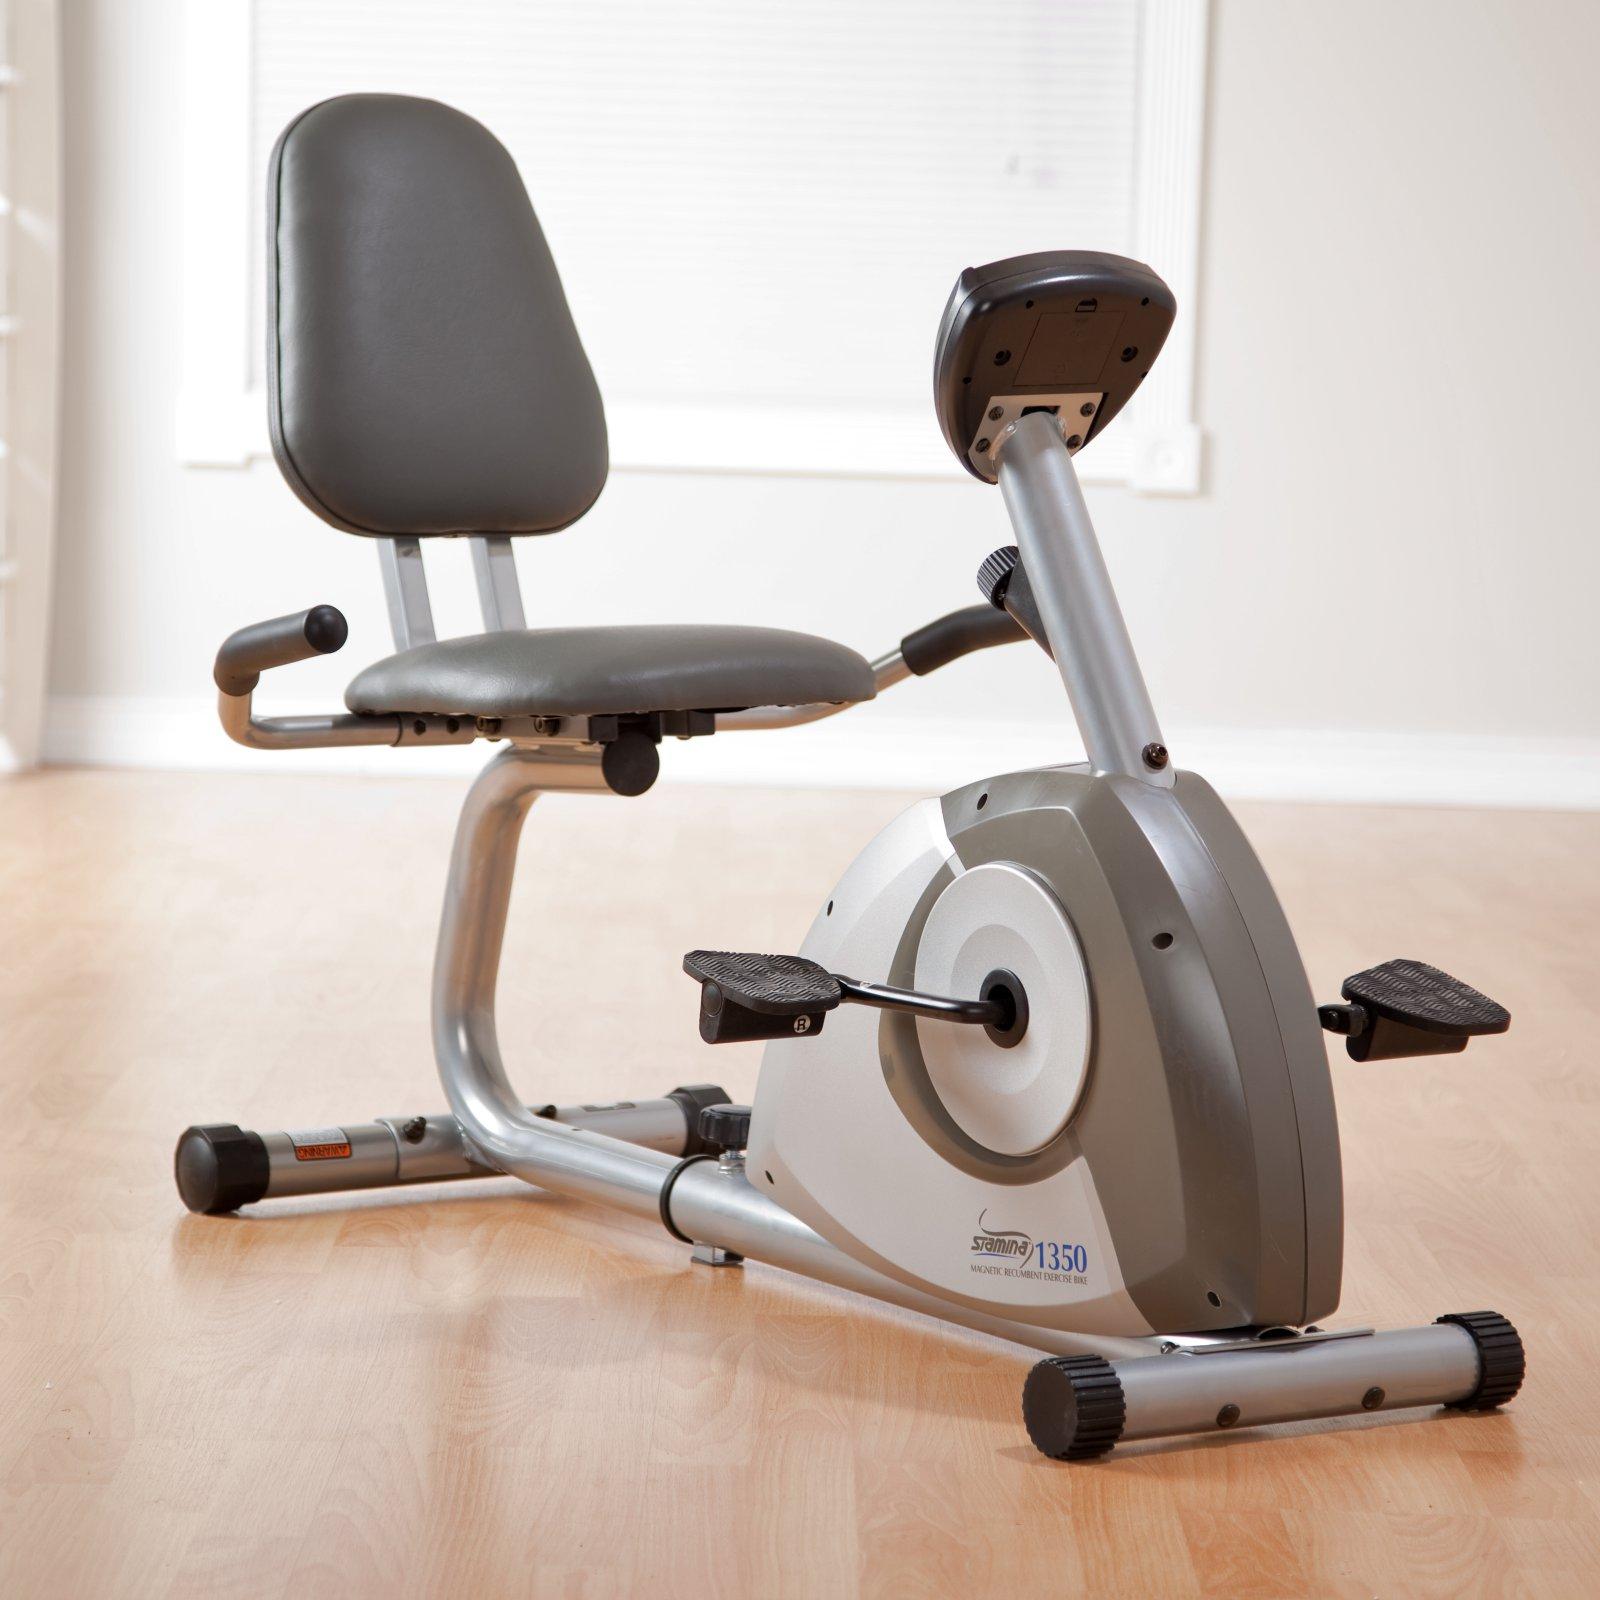 Stamina 1350 Magnetic Recumbent Exercise Bike Recumbent Bike Workout Exercise Bikes Biking Workout